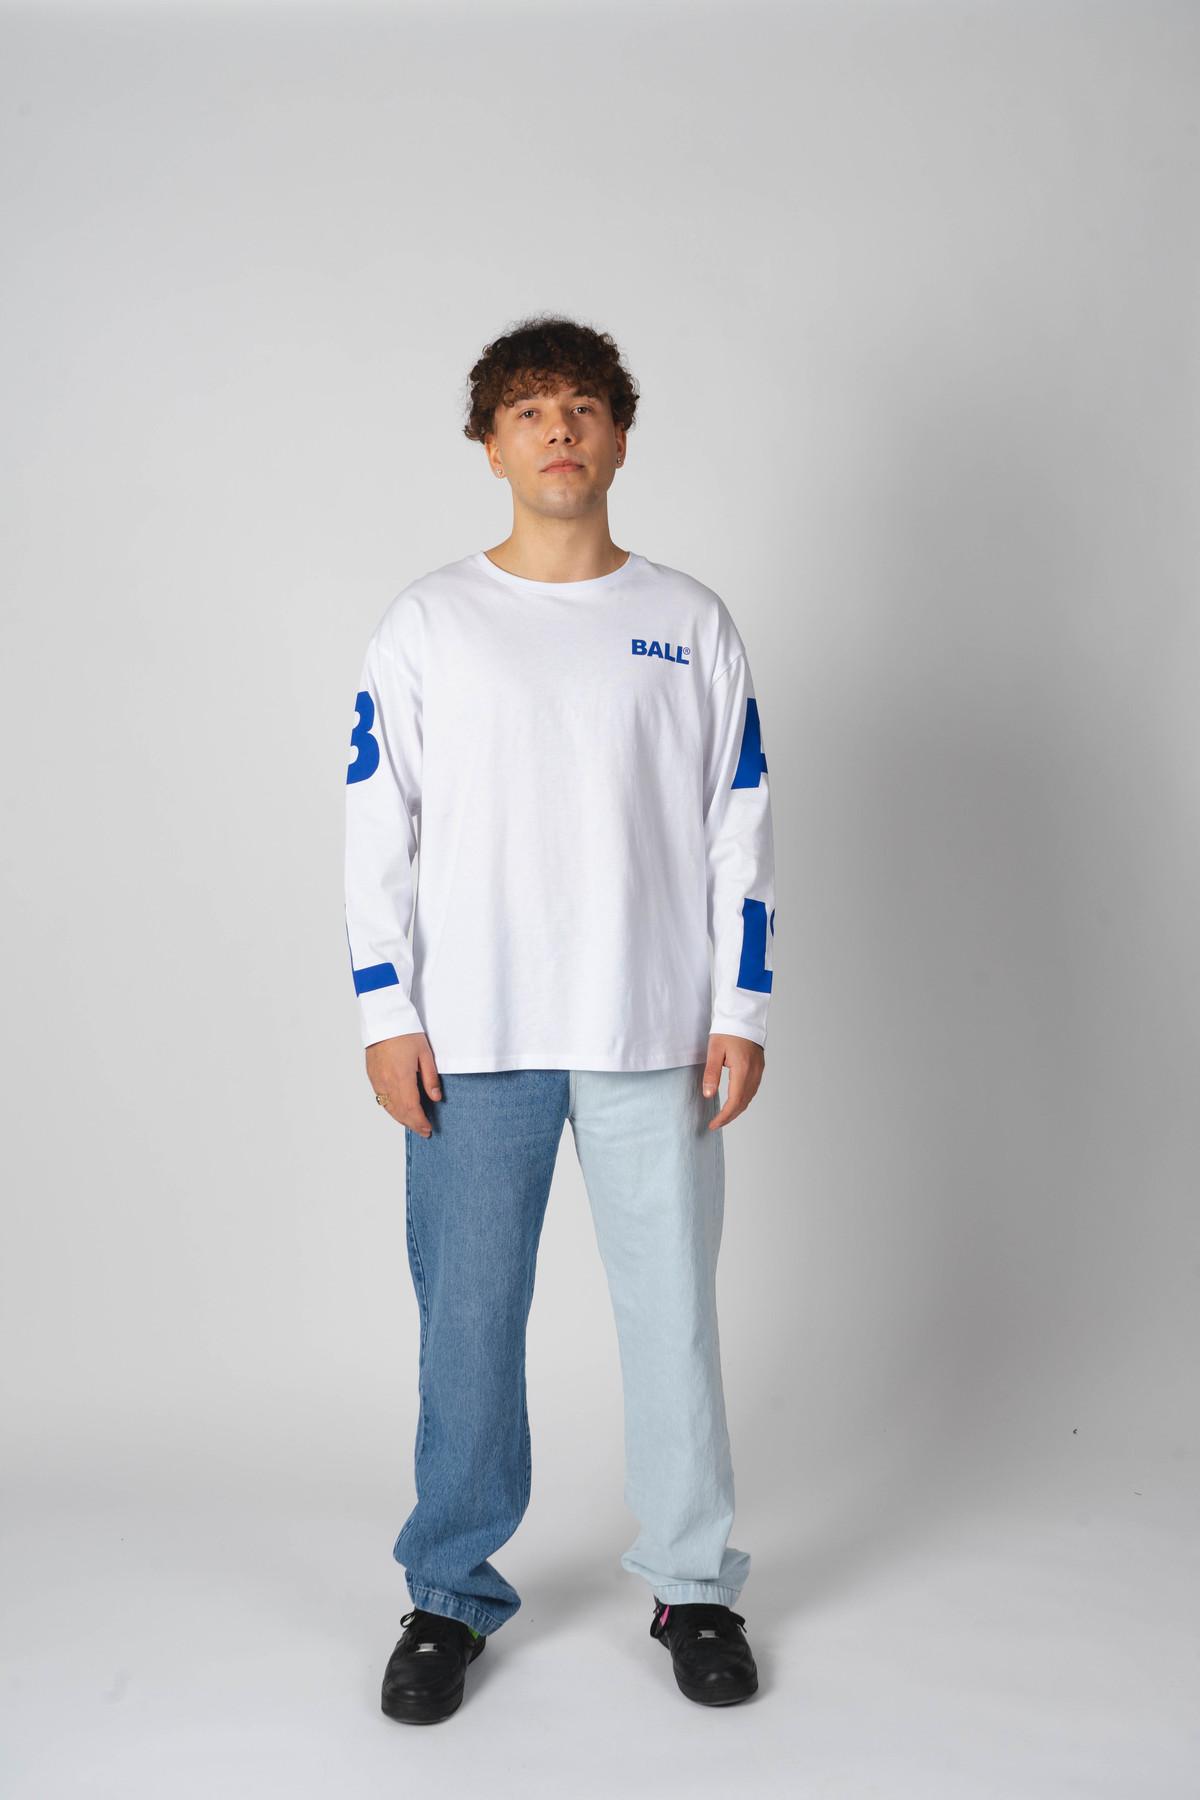 BALL Original LS Tee langærmet t-shirt, optical white, XS